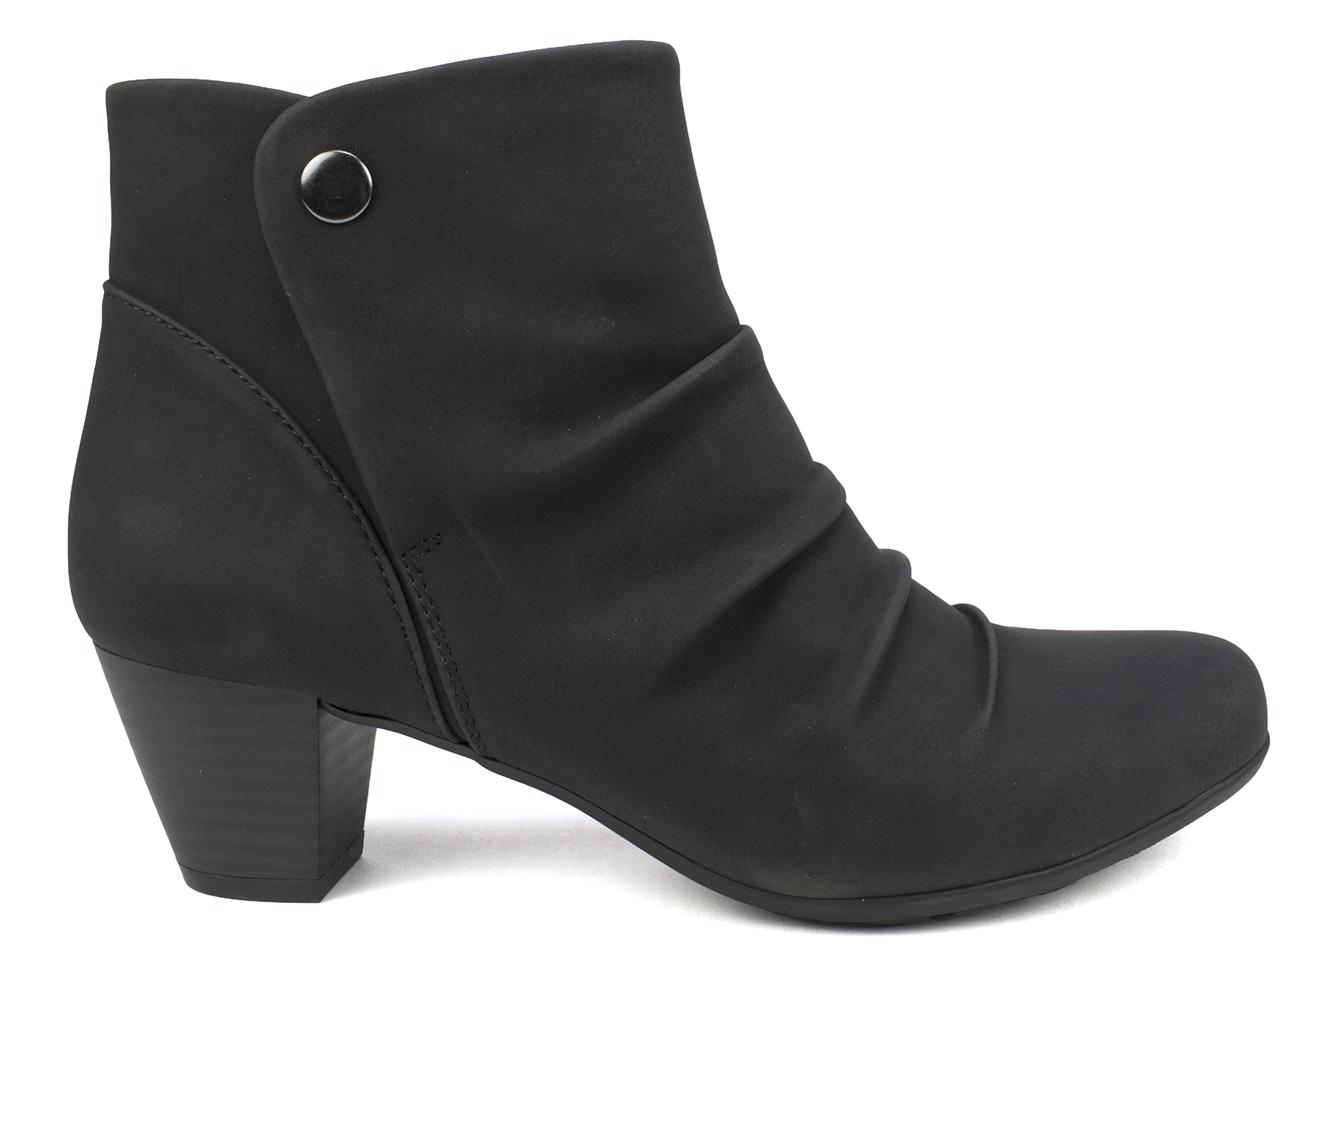 Cliffs Landon Women's Boot (Black Canvas)